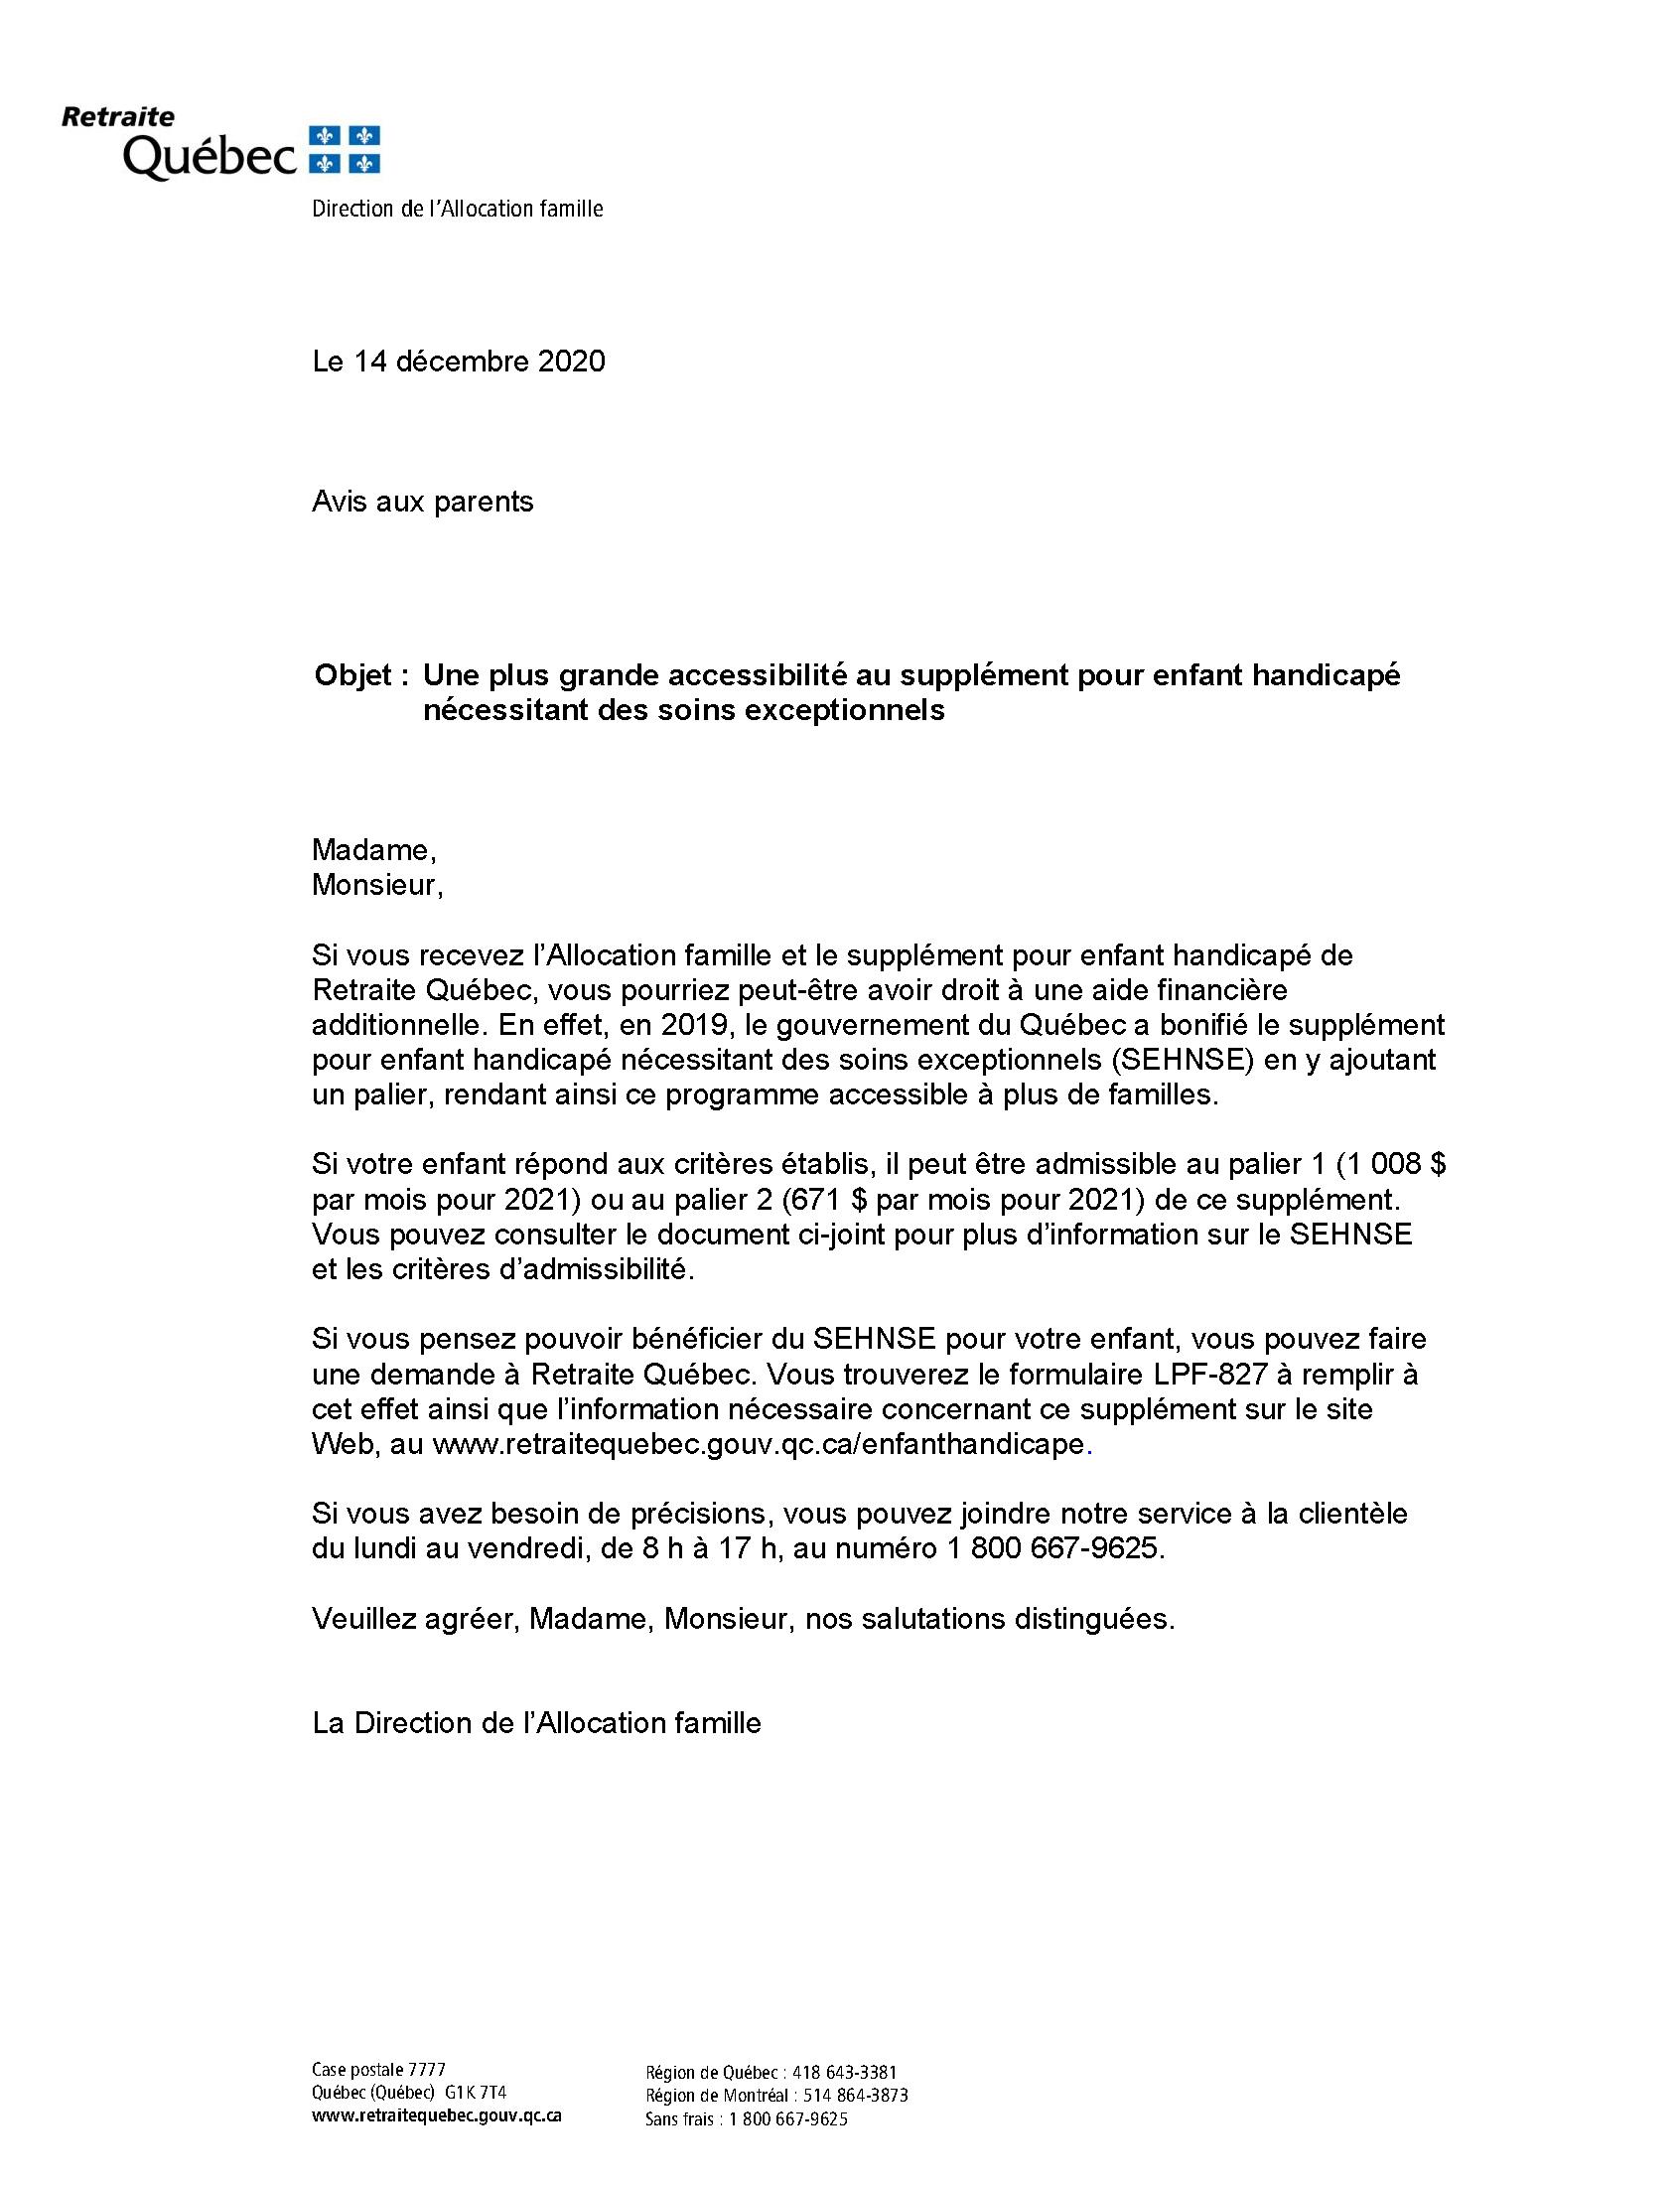 Lettre_SEHNSE_F_2020_12_11